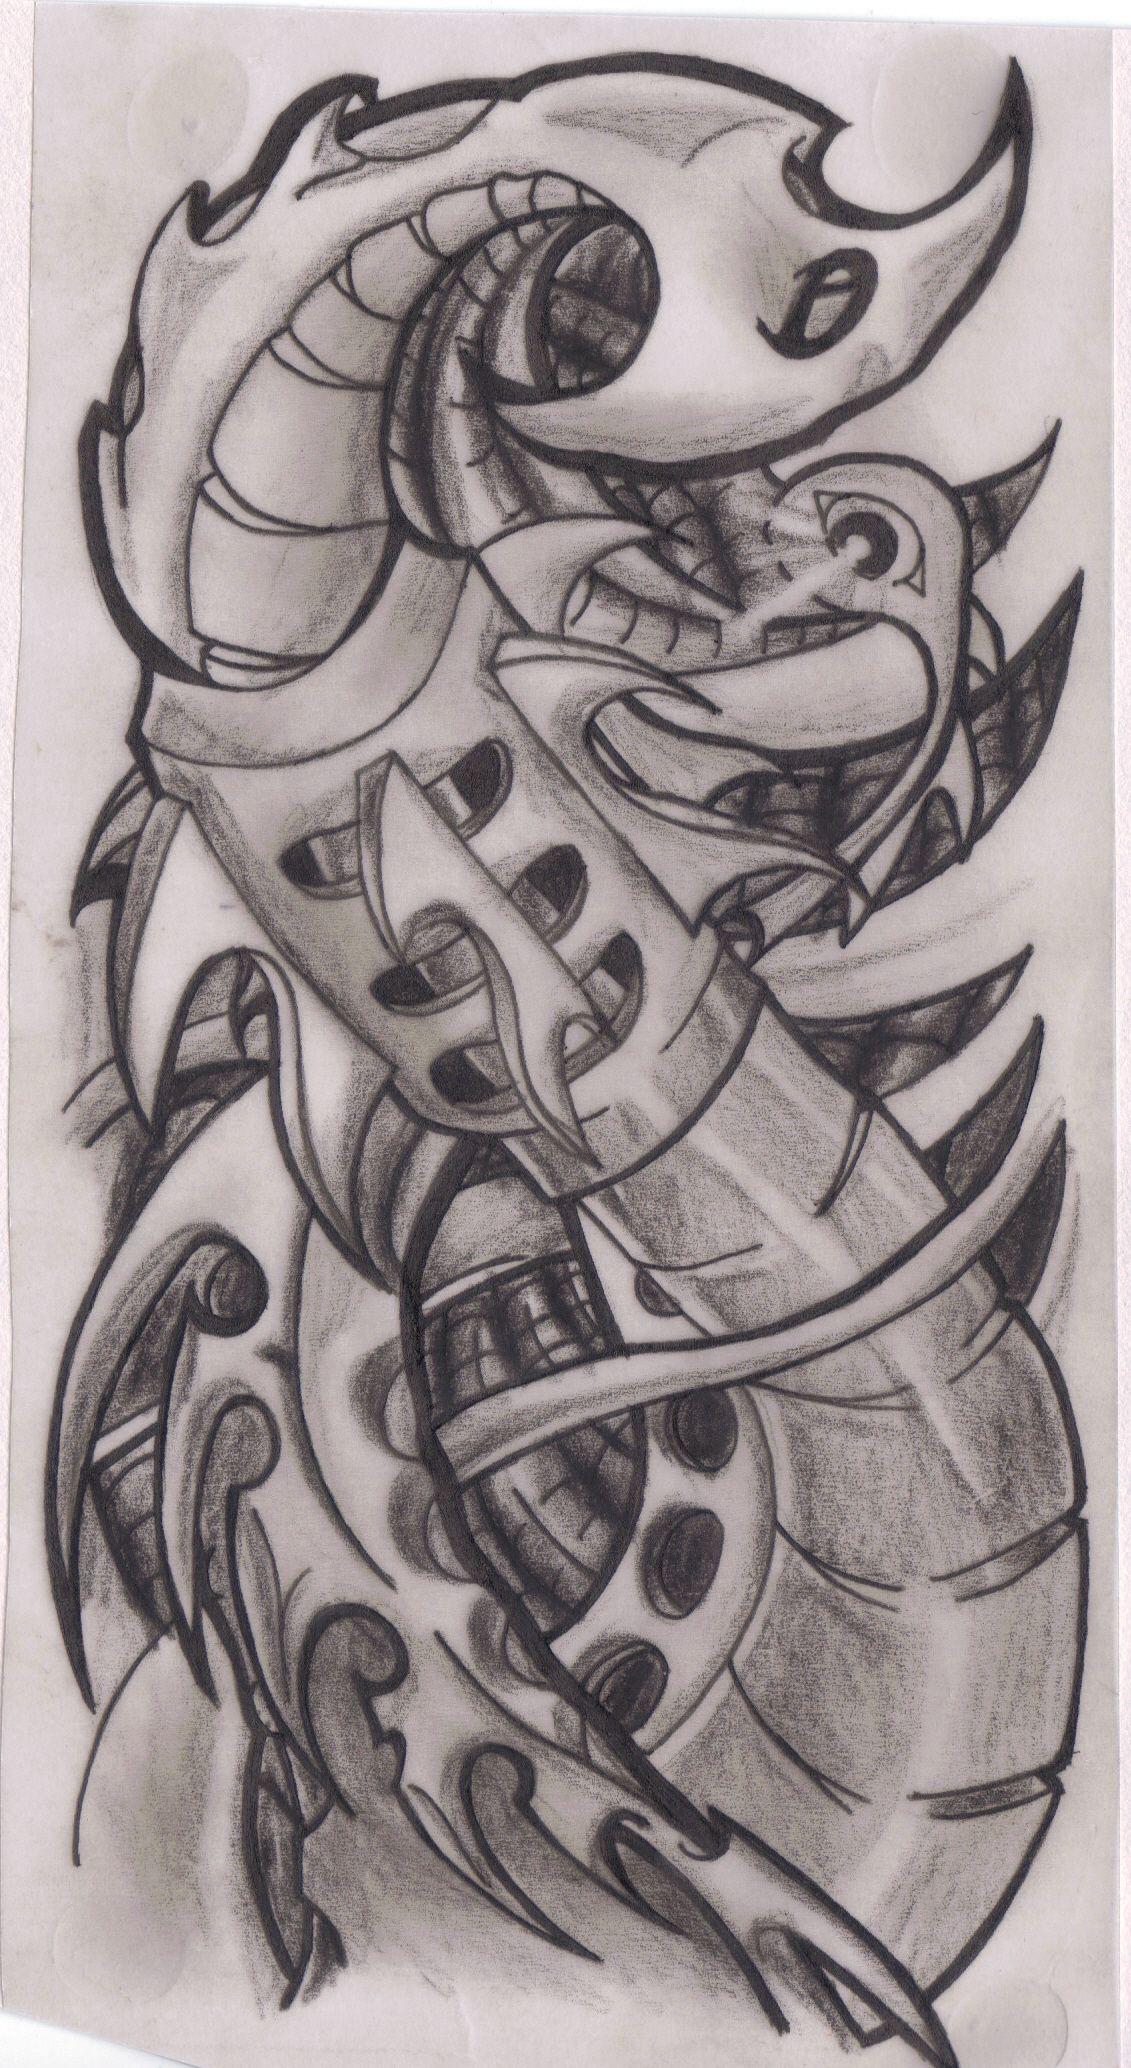 Biomechanical tattoo design by A Kir on Tatto